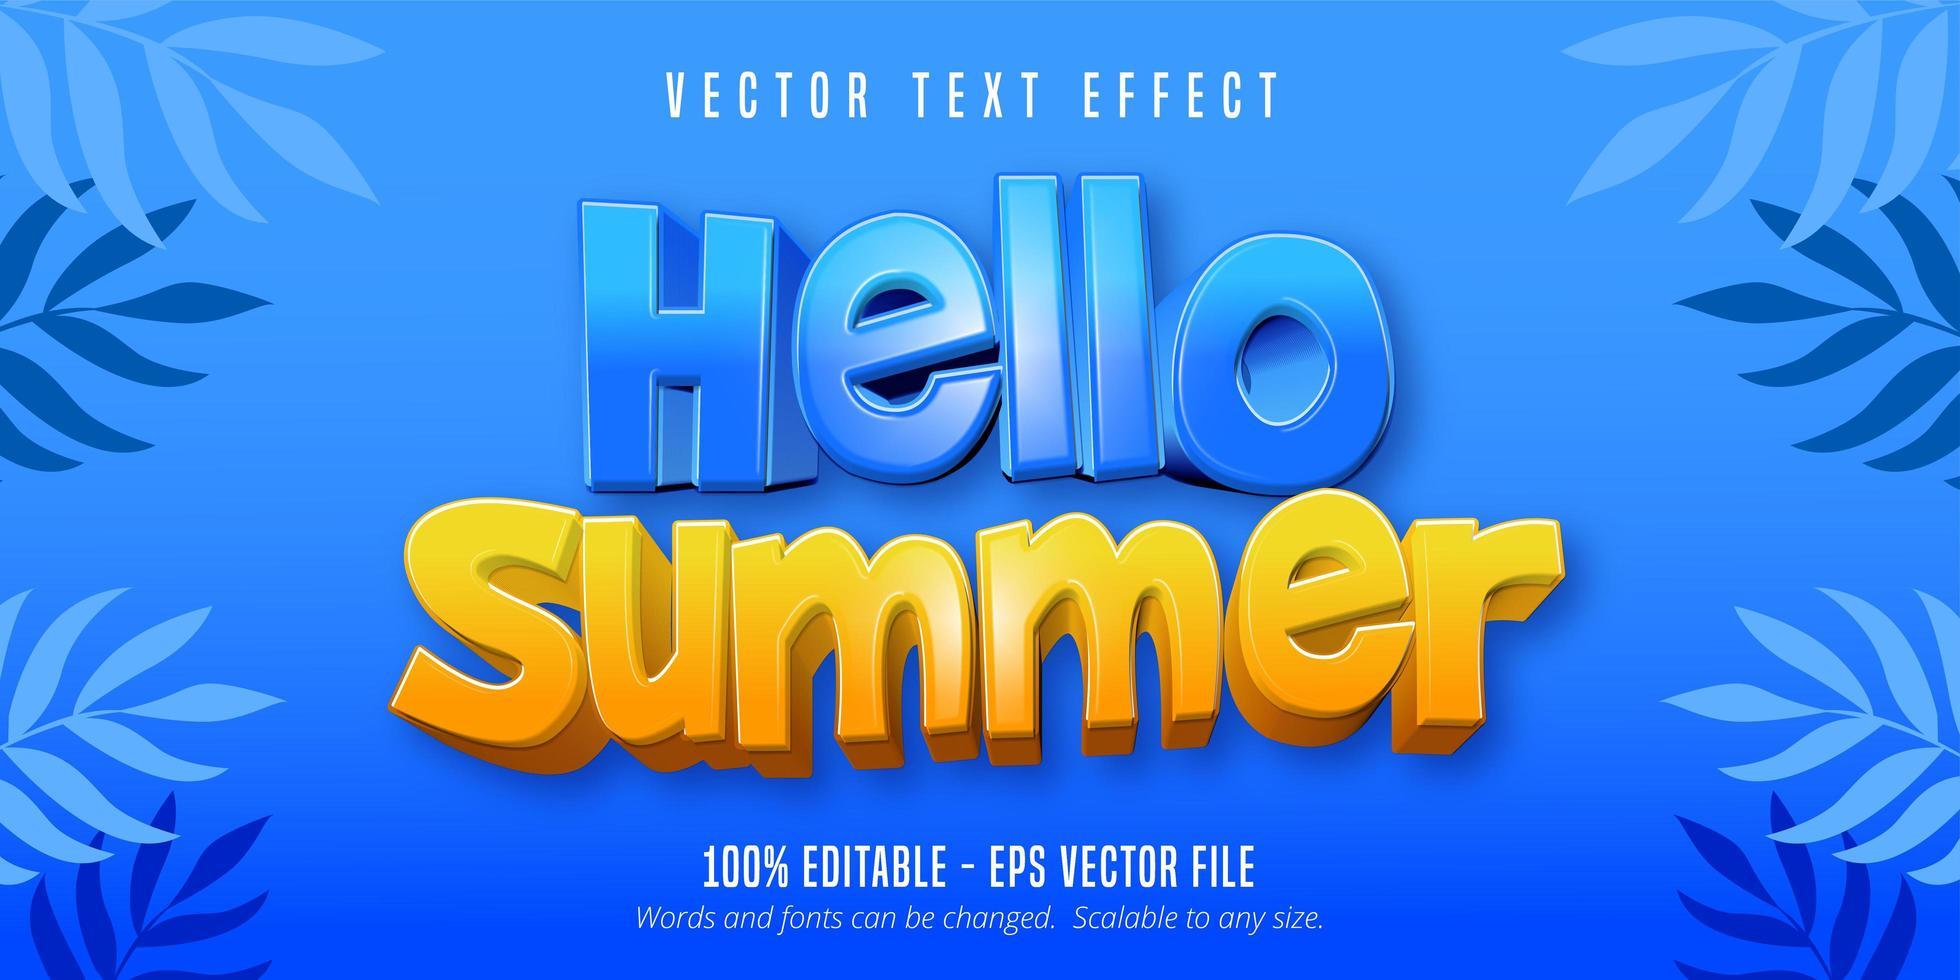 hej sommar text, tecknad stil redigerbar text effekt vektor